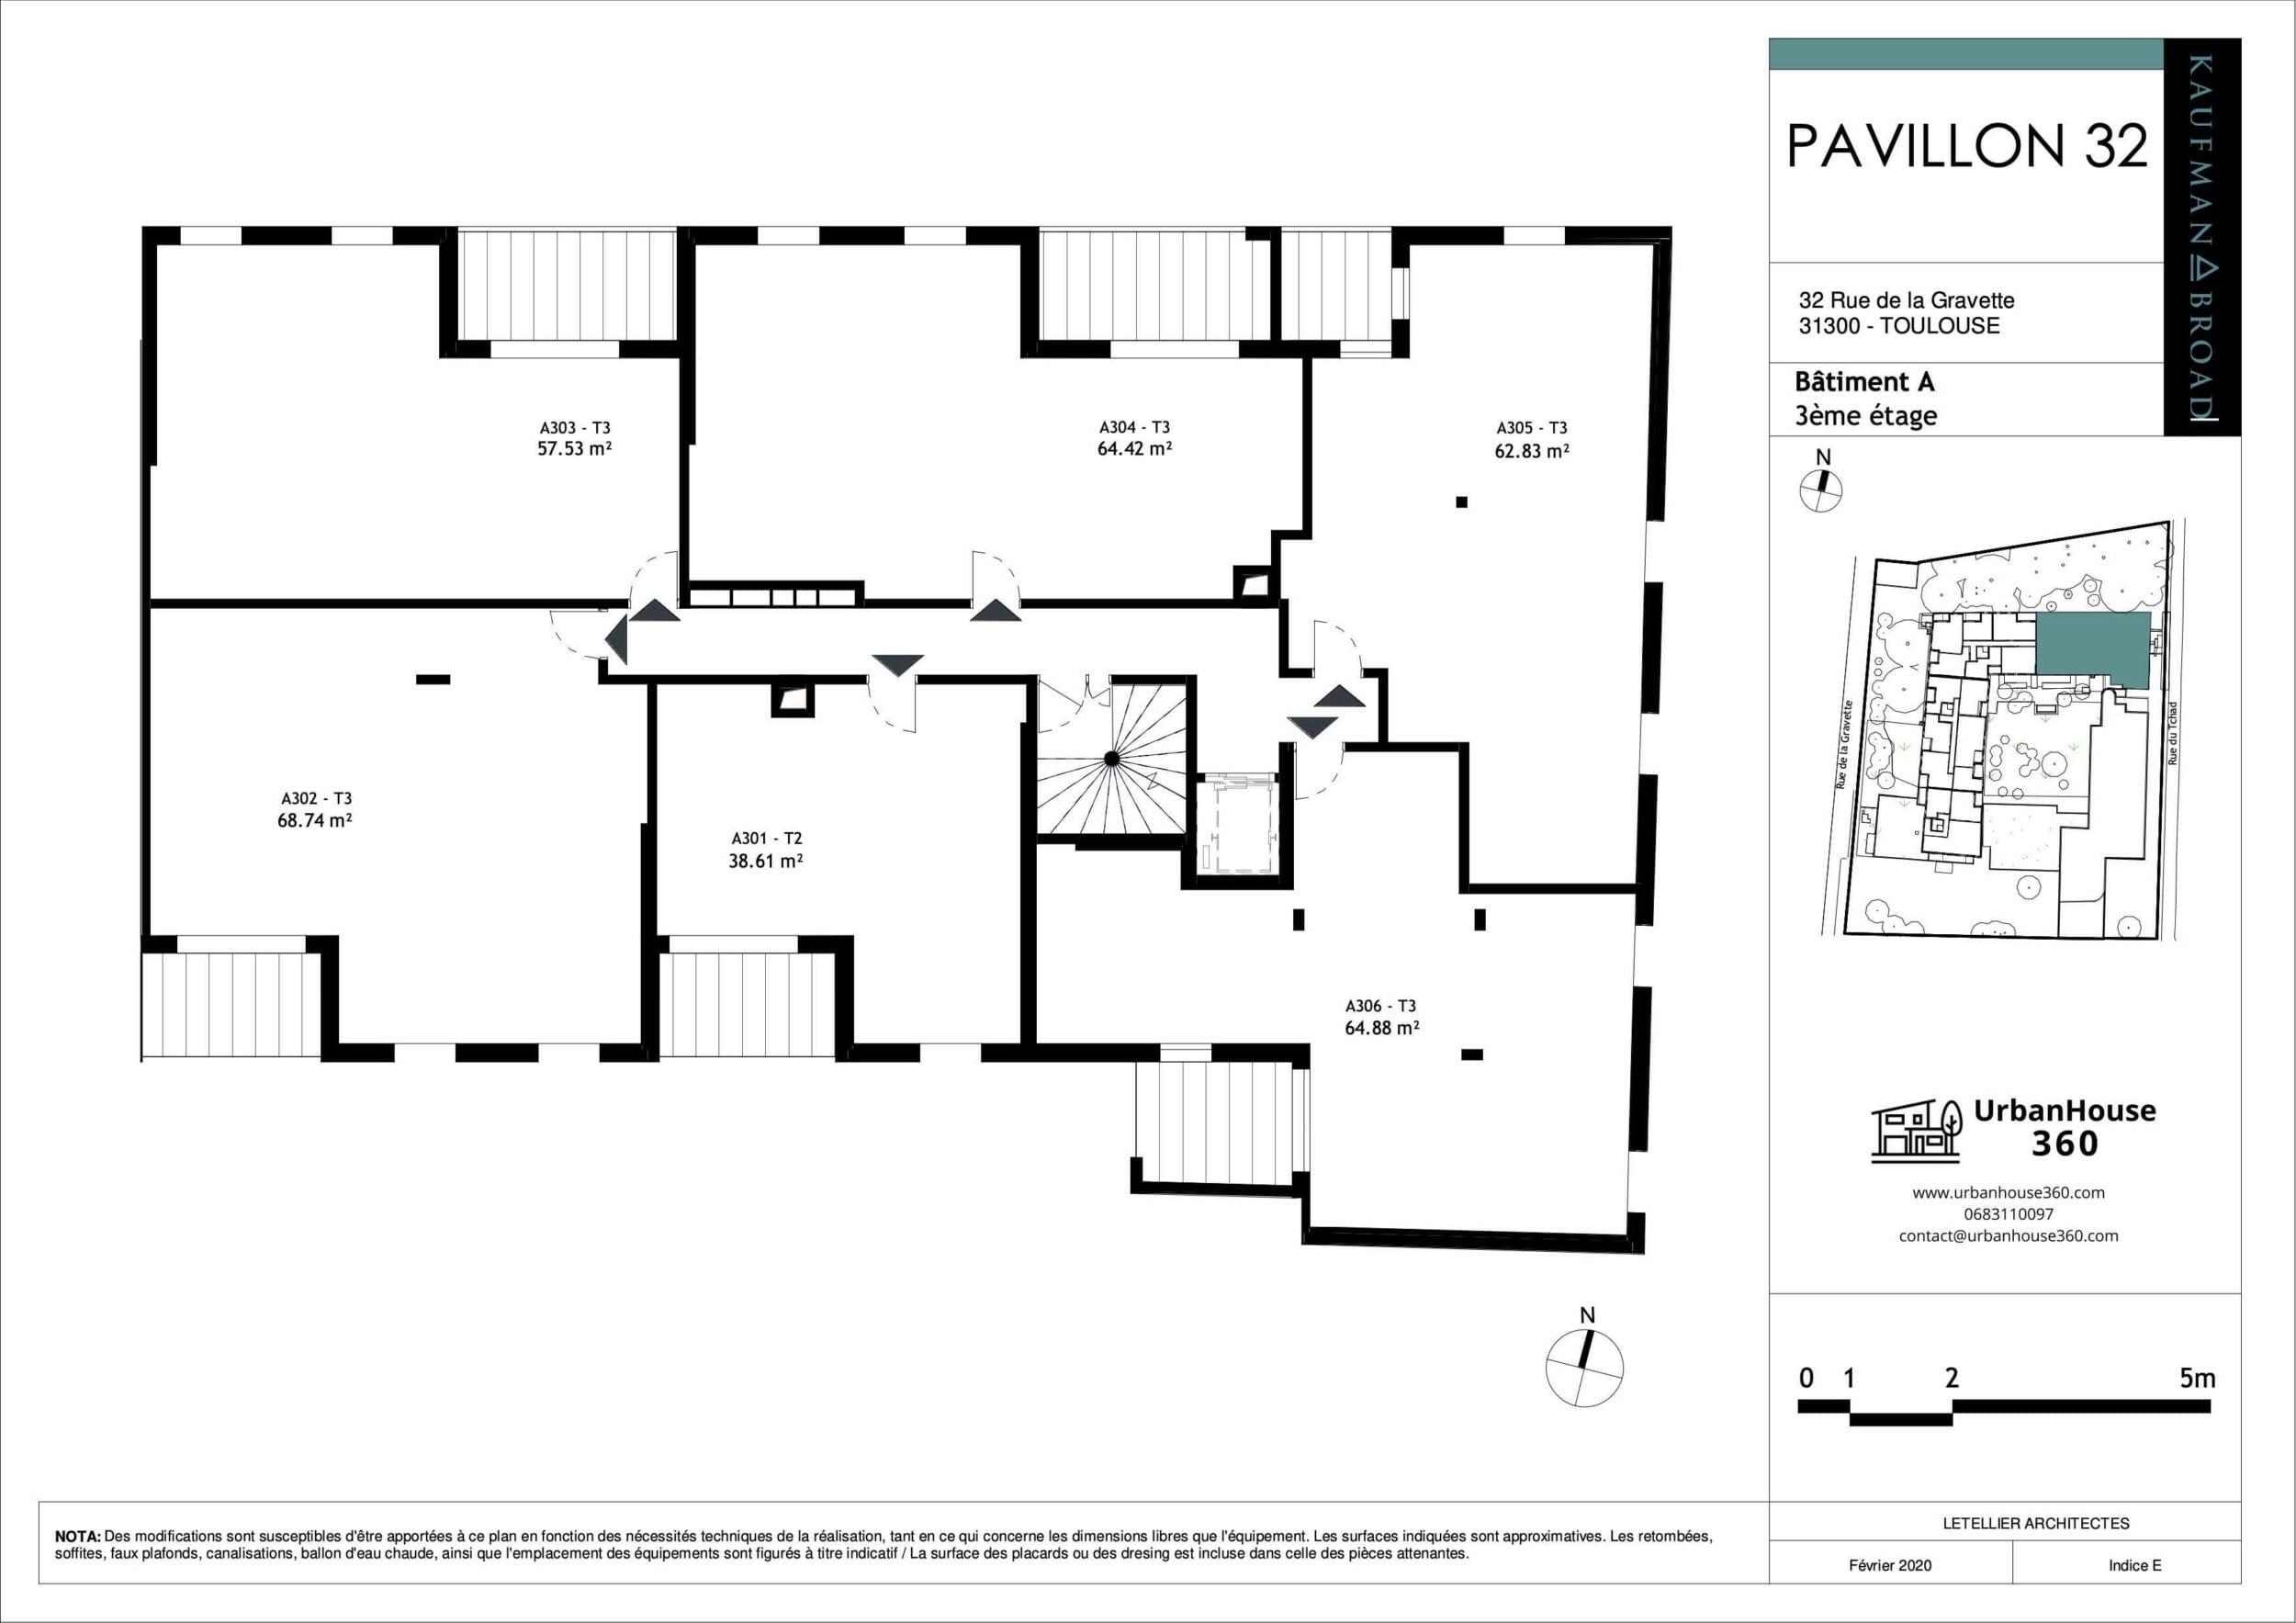 UrbanHouse360-Pavillon32-A_R+3_ind E 2